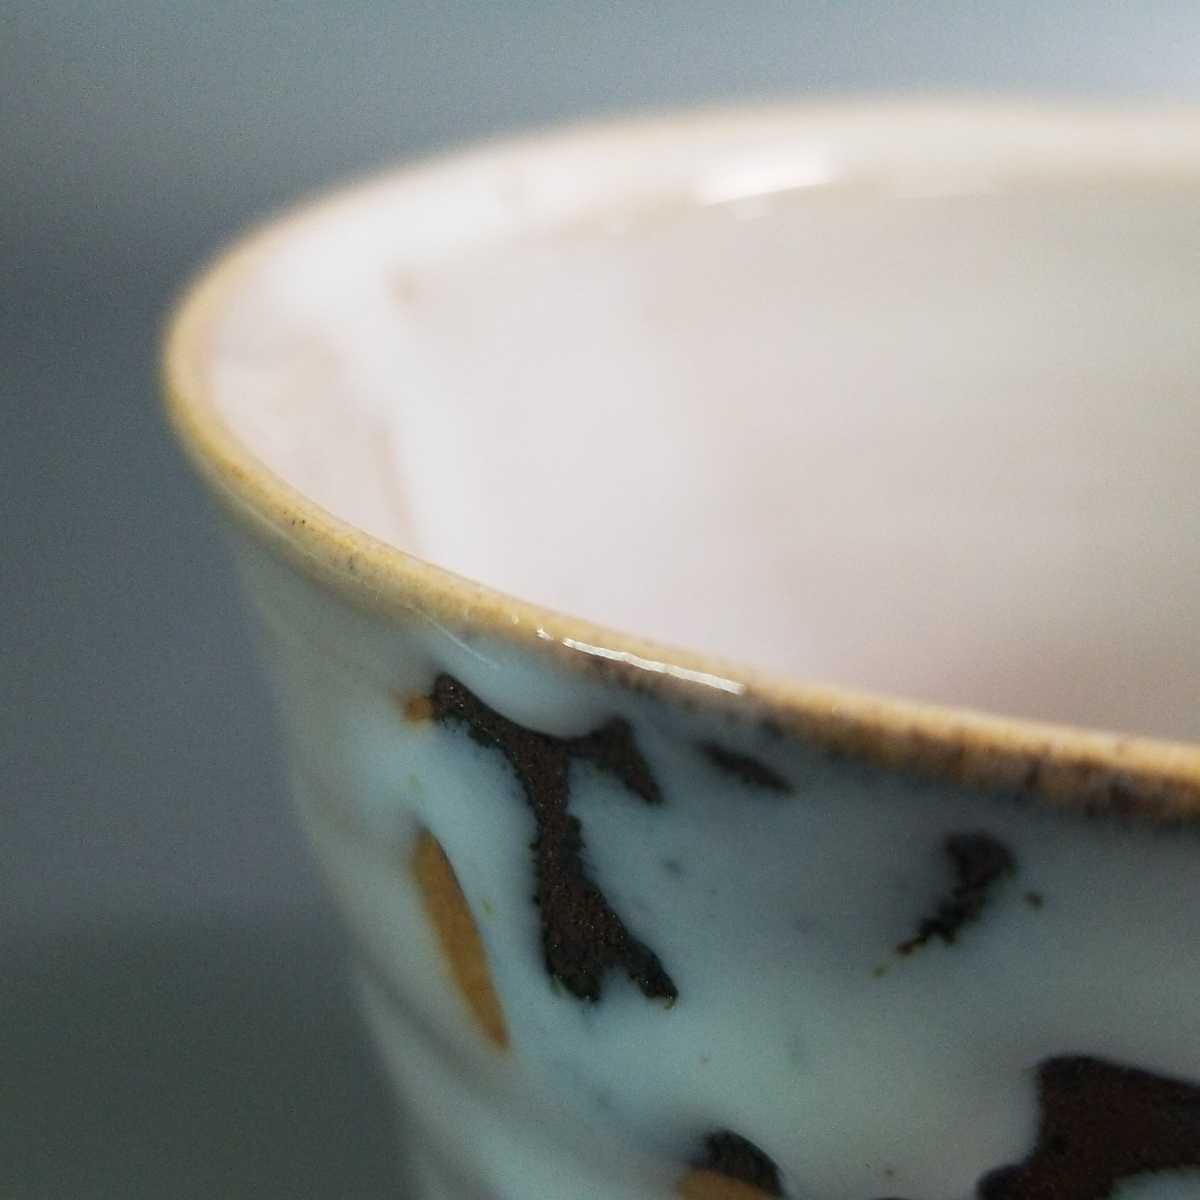 賜67)萩焼 渋谷泥詩 白萩マグカップ 珈琲器 茶器 未使用新品 同梱歓迎 _画像10